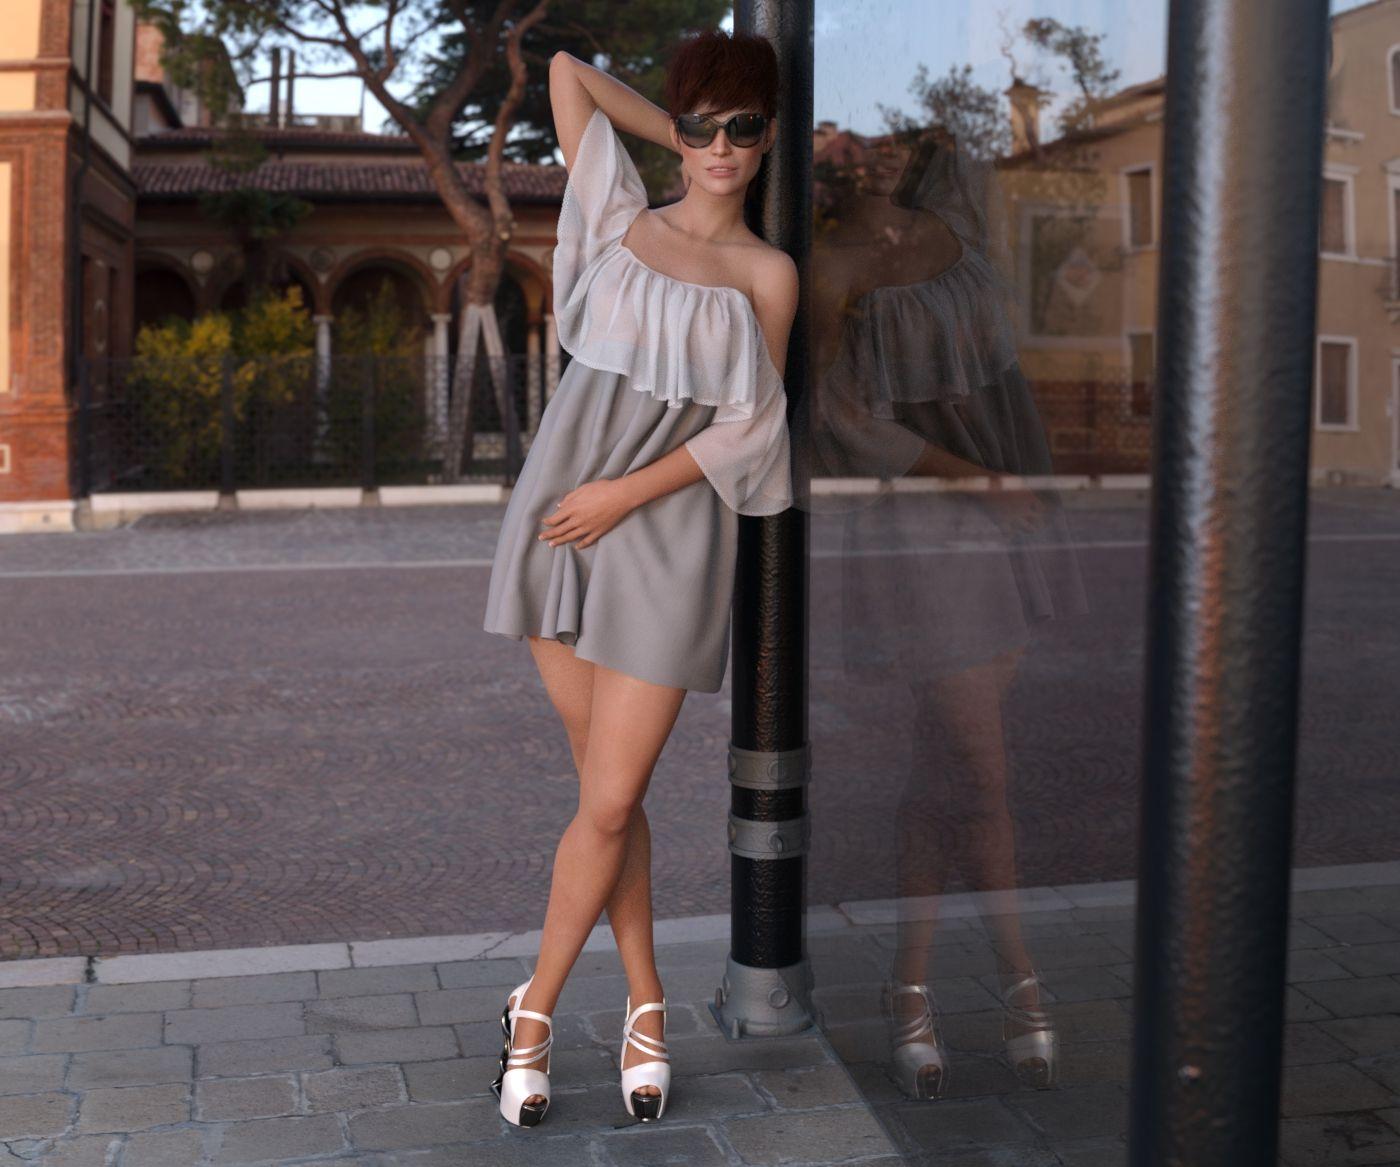 Sally outdoor by ziege58 on DeviantArt | 3d models | Outdoor